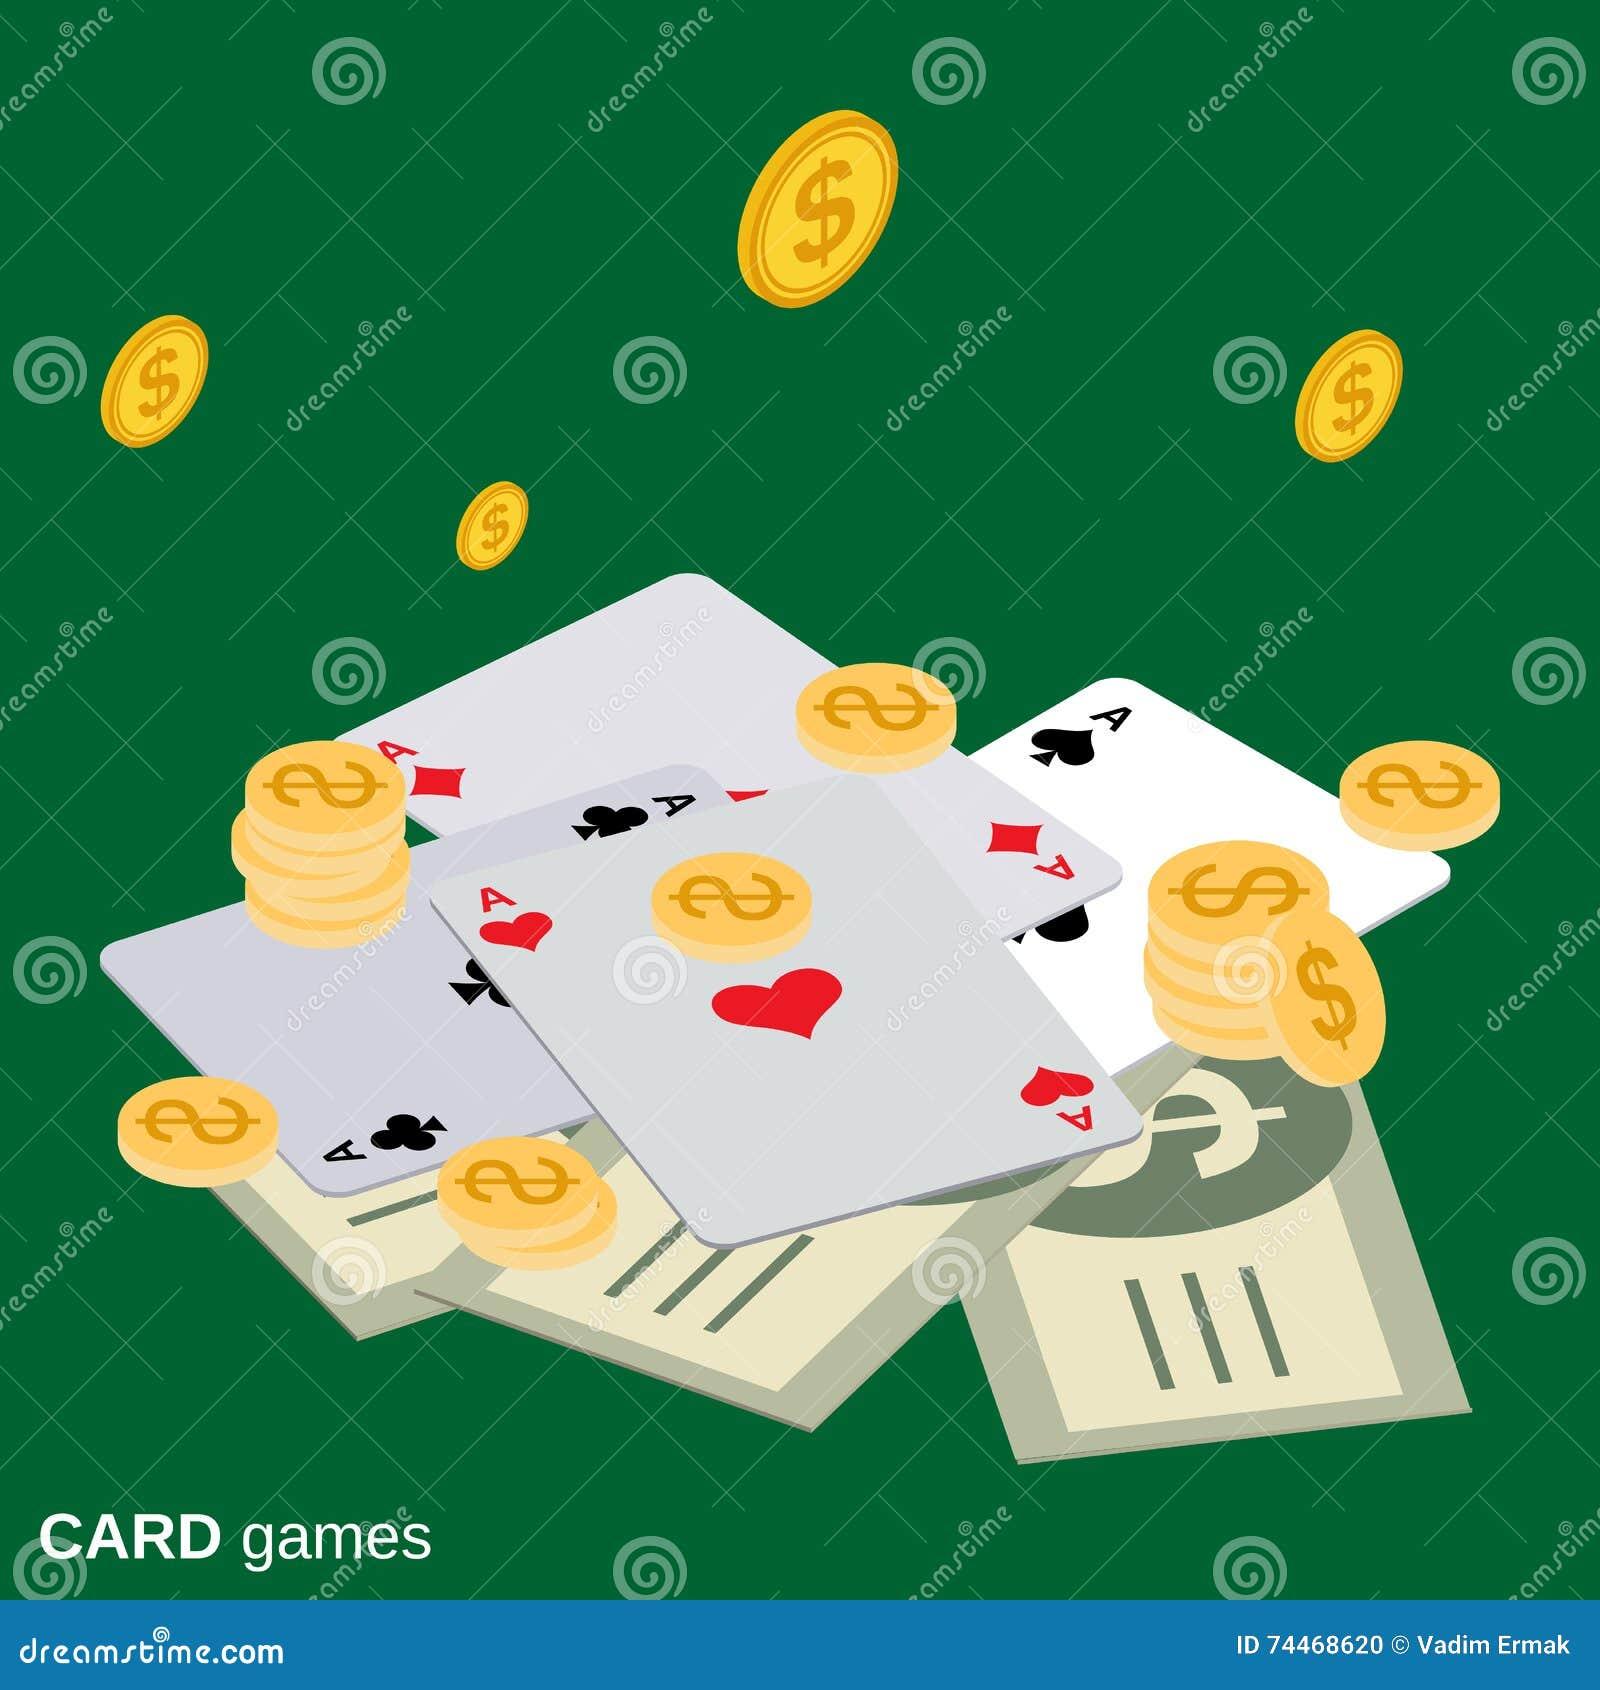 Card games vector illustration